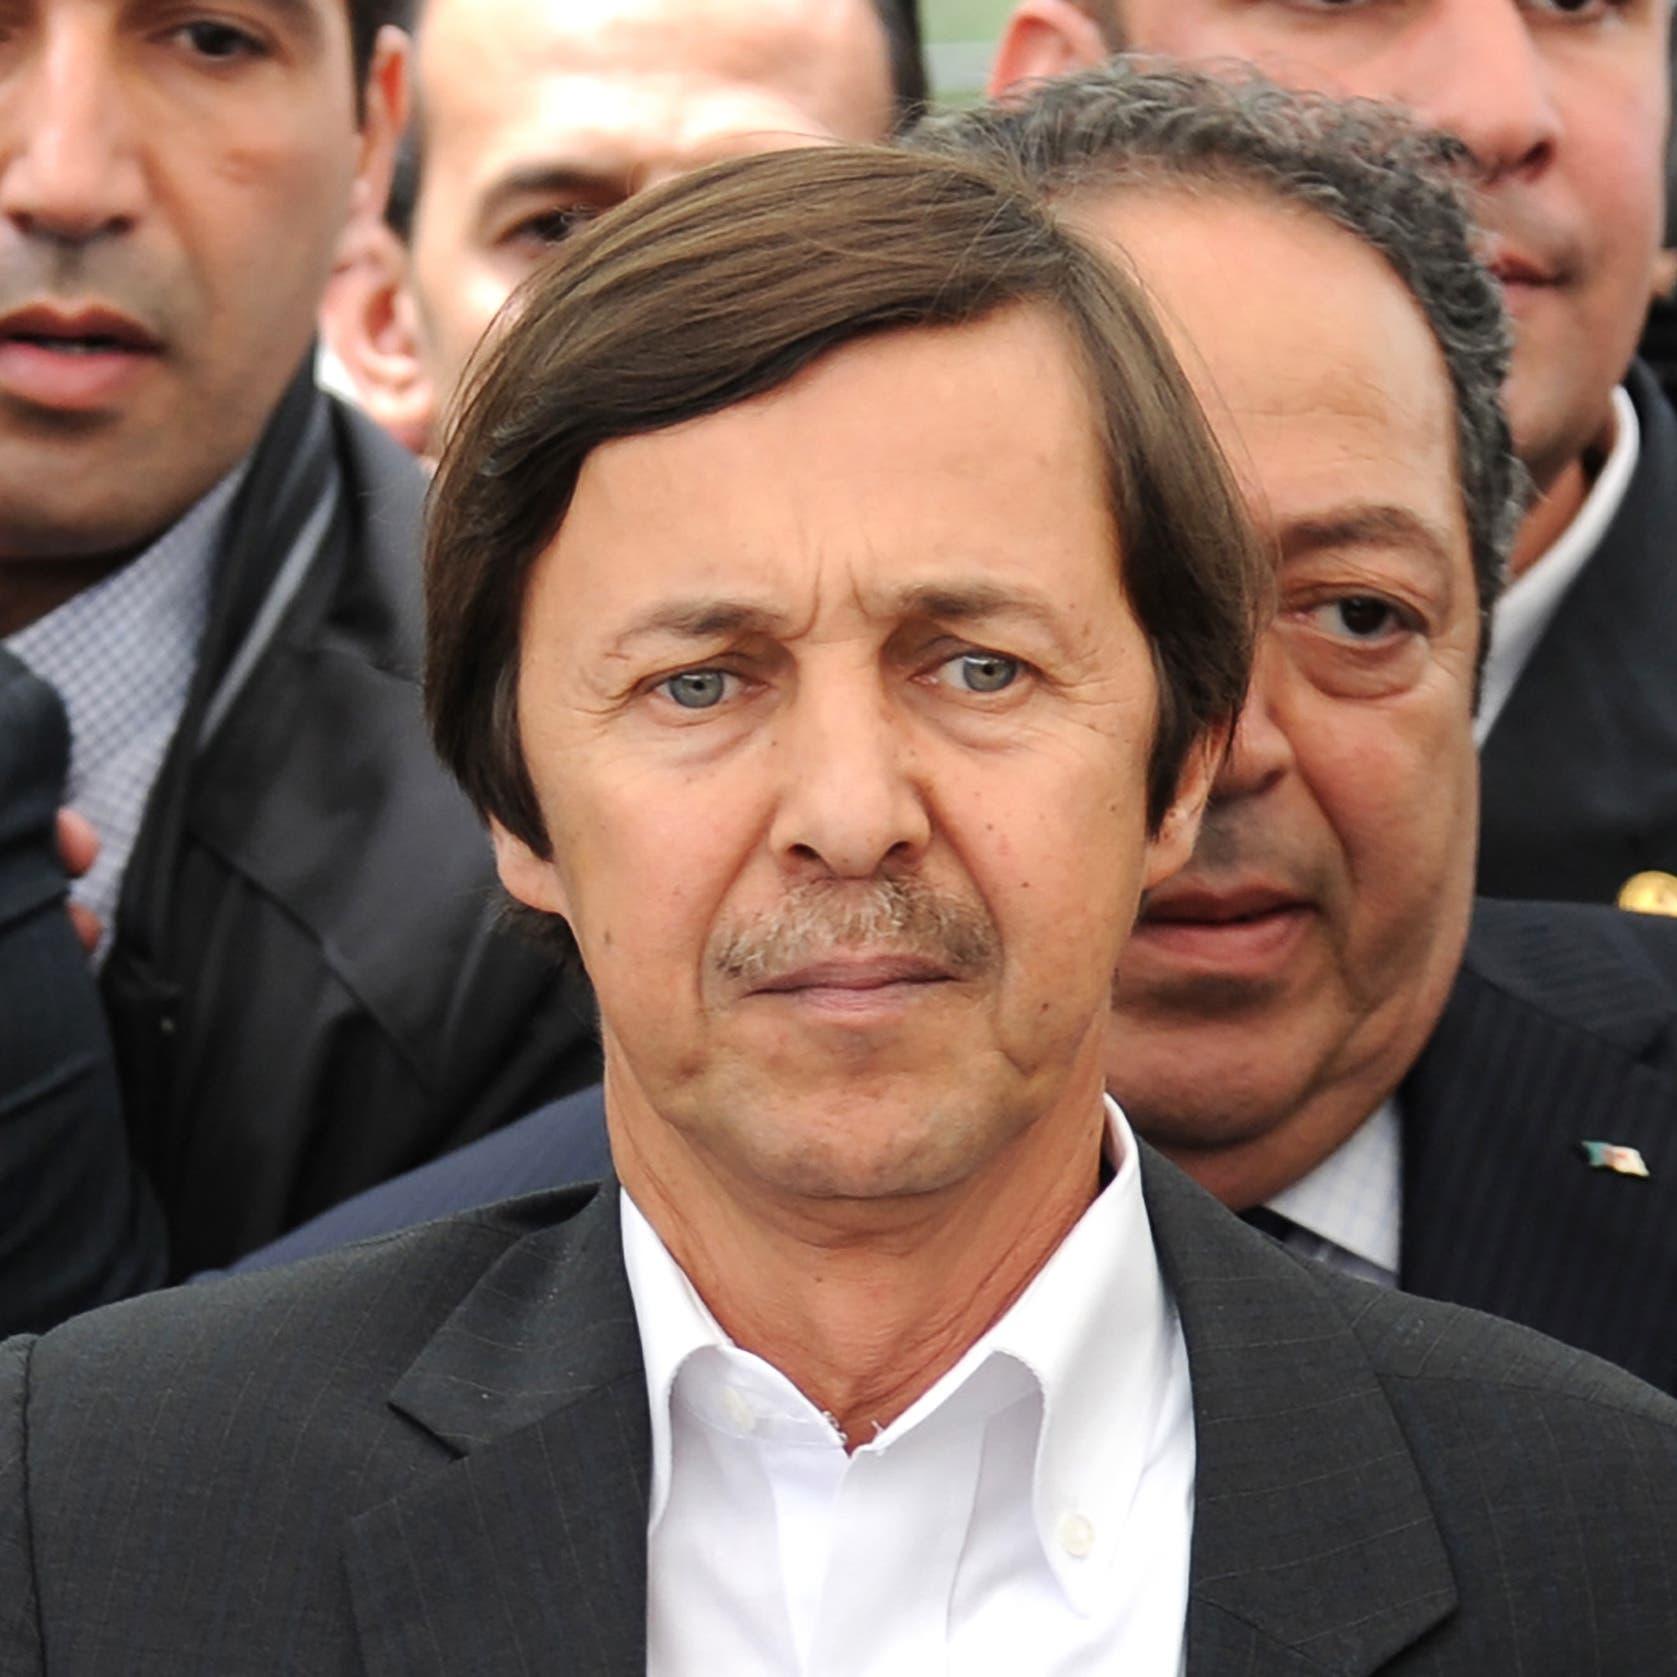 Algeria's prosecutors seek 20-year sentence for Bouteflika's brother